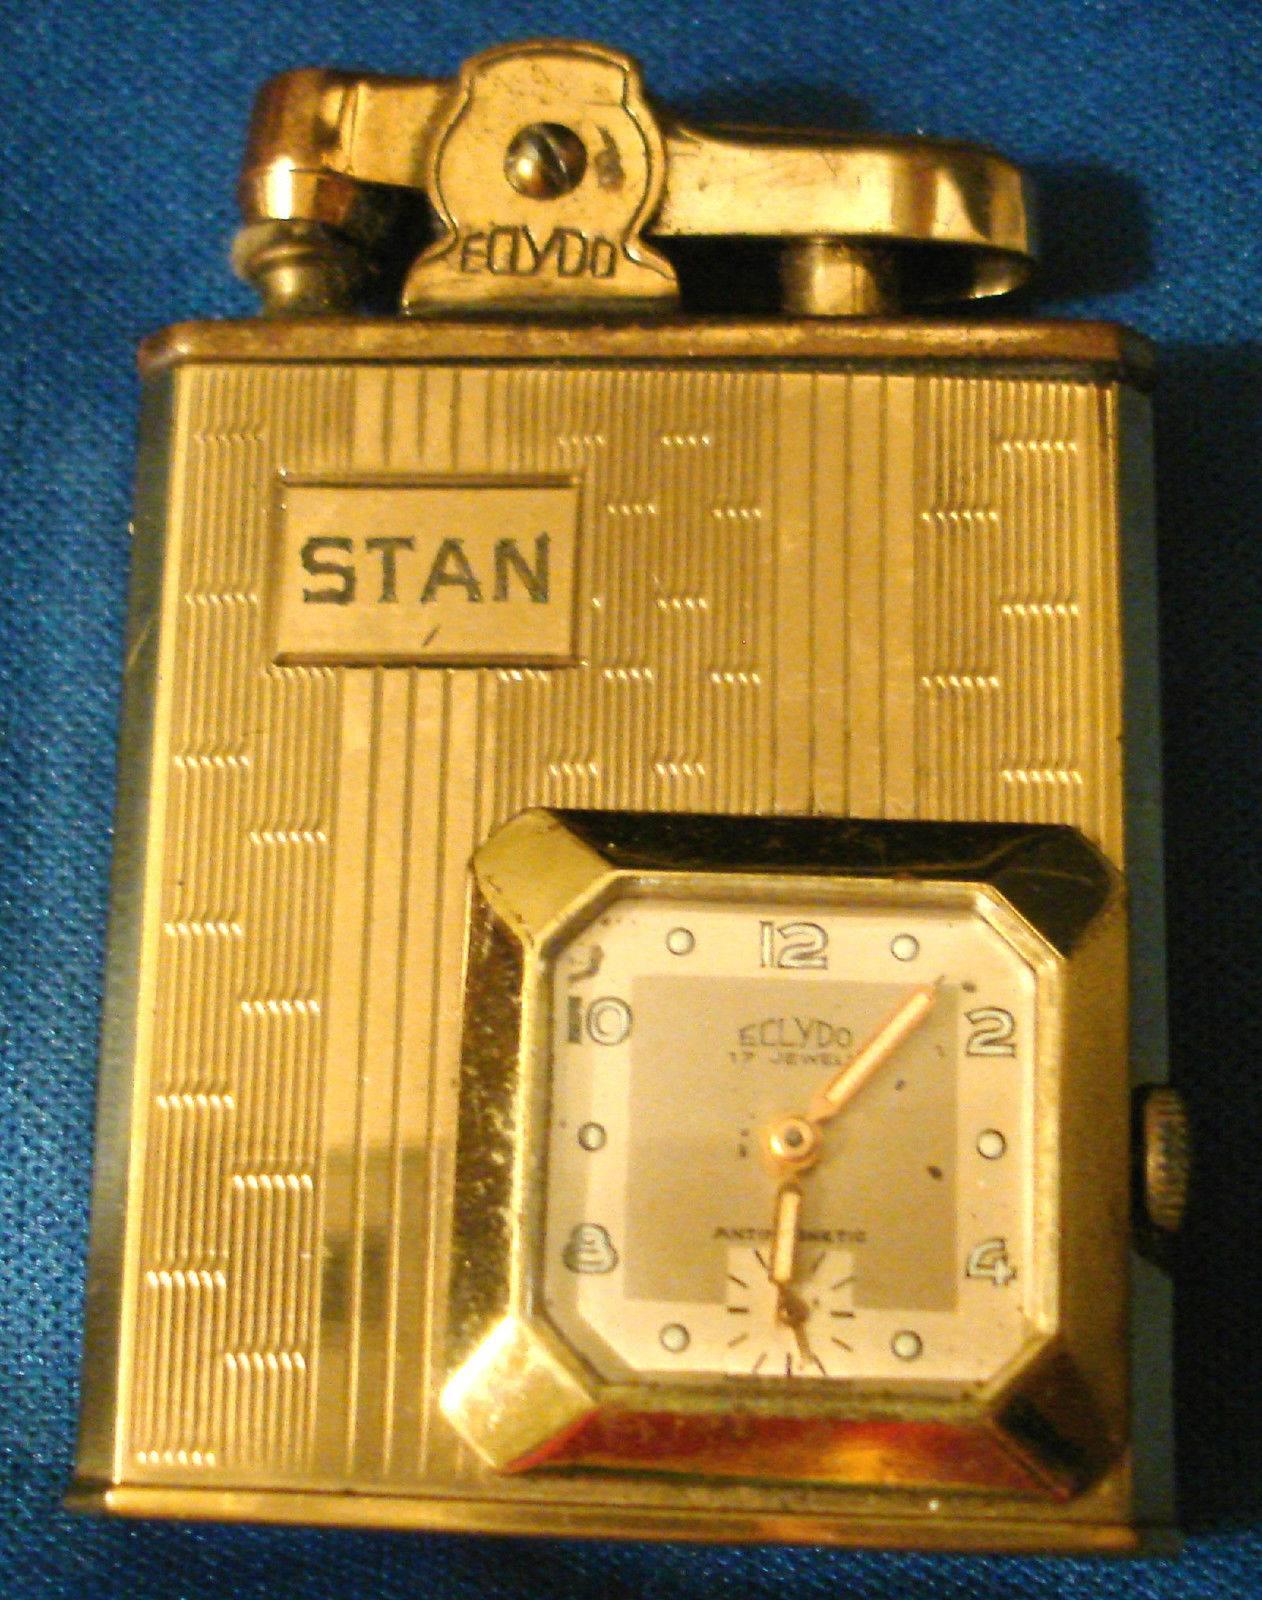 "STAN MUSIAL'S Own 1950's Eclydo ""STAN"" Lighter Clock Combo"